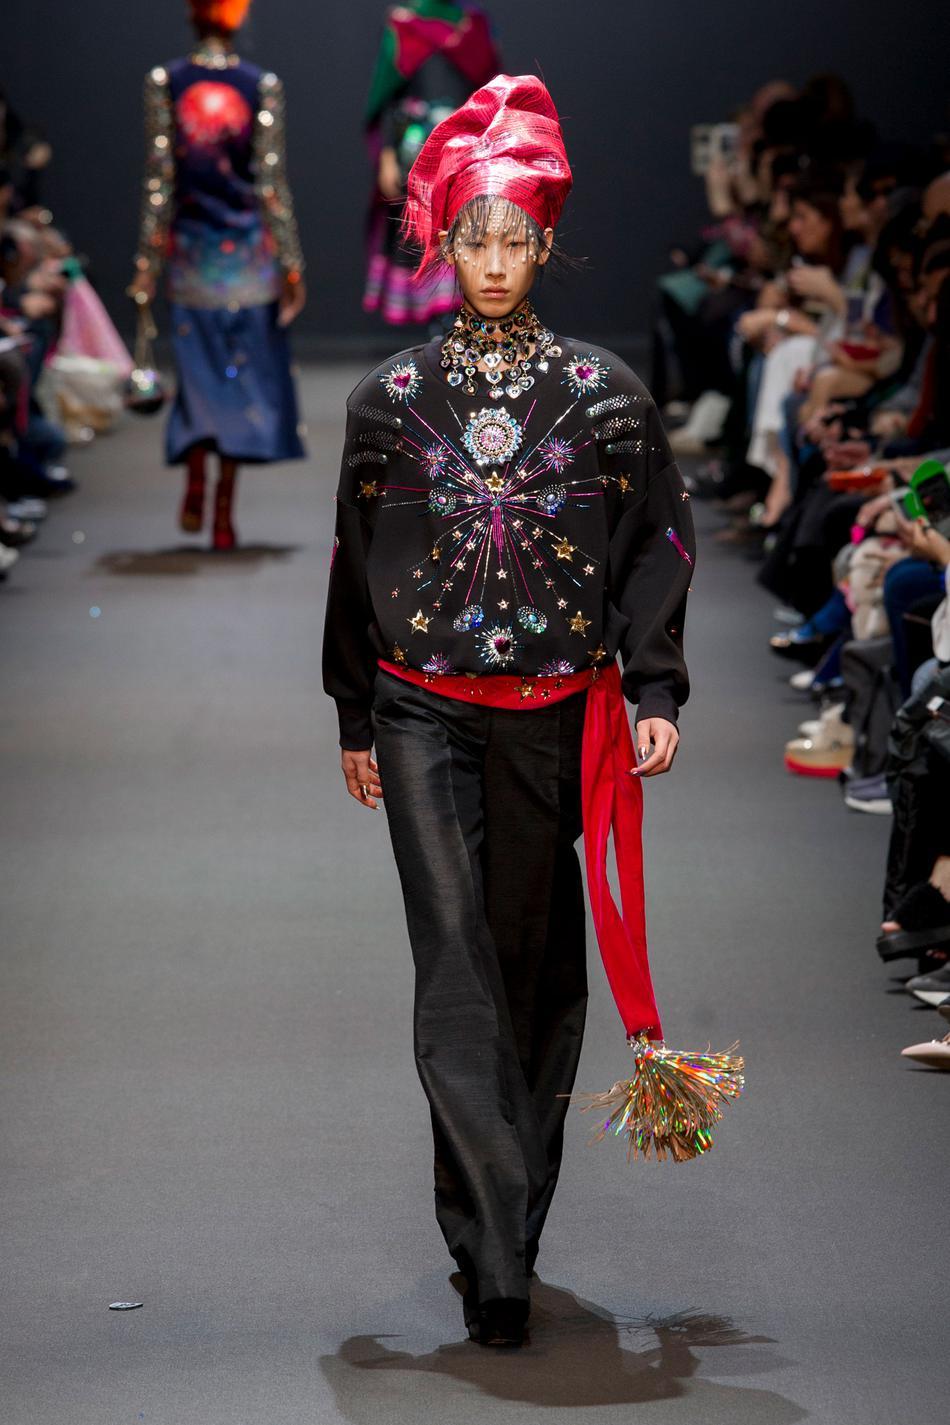 Défilé Manish Arora Fashion Week 2017 - Look 27